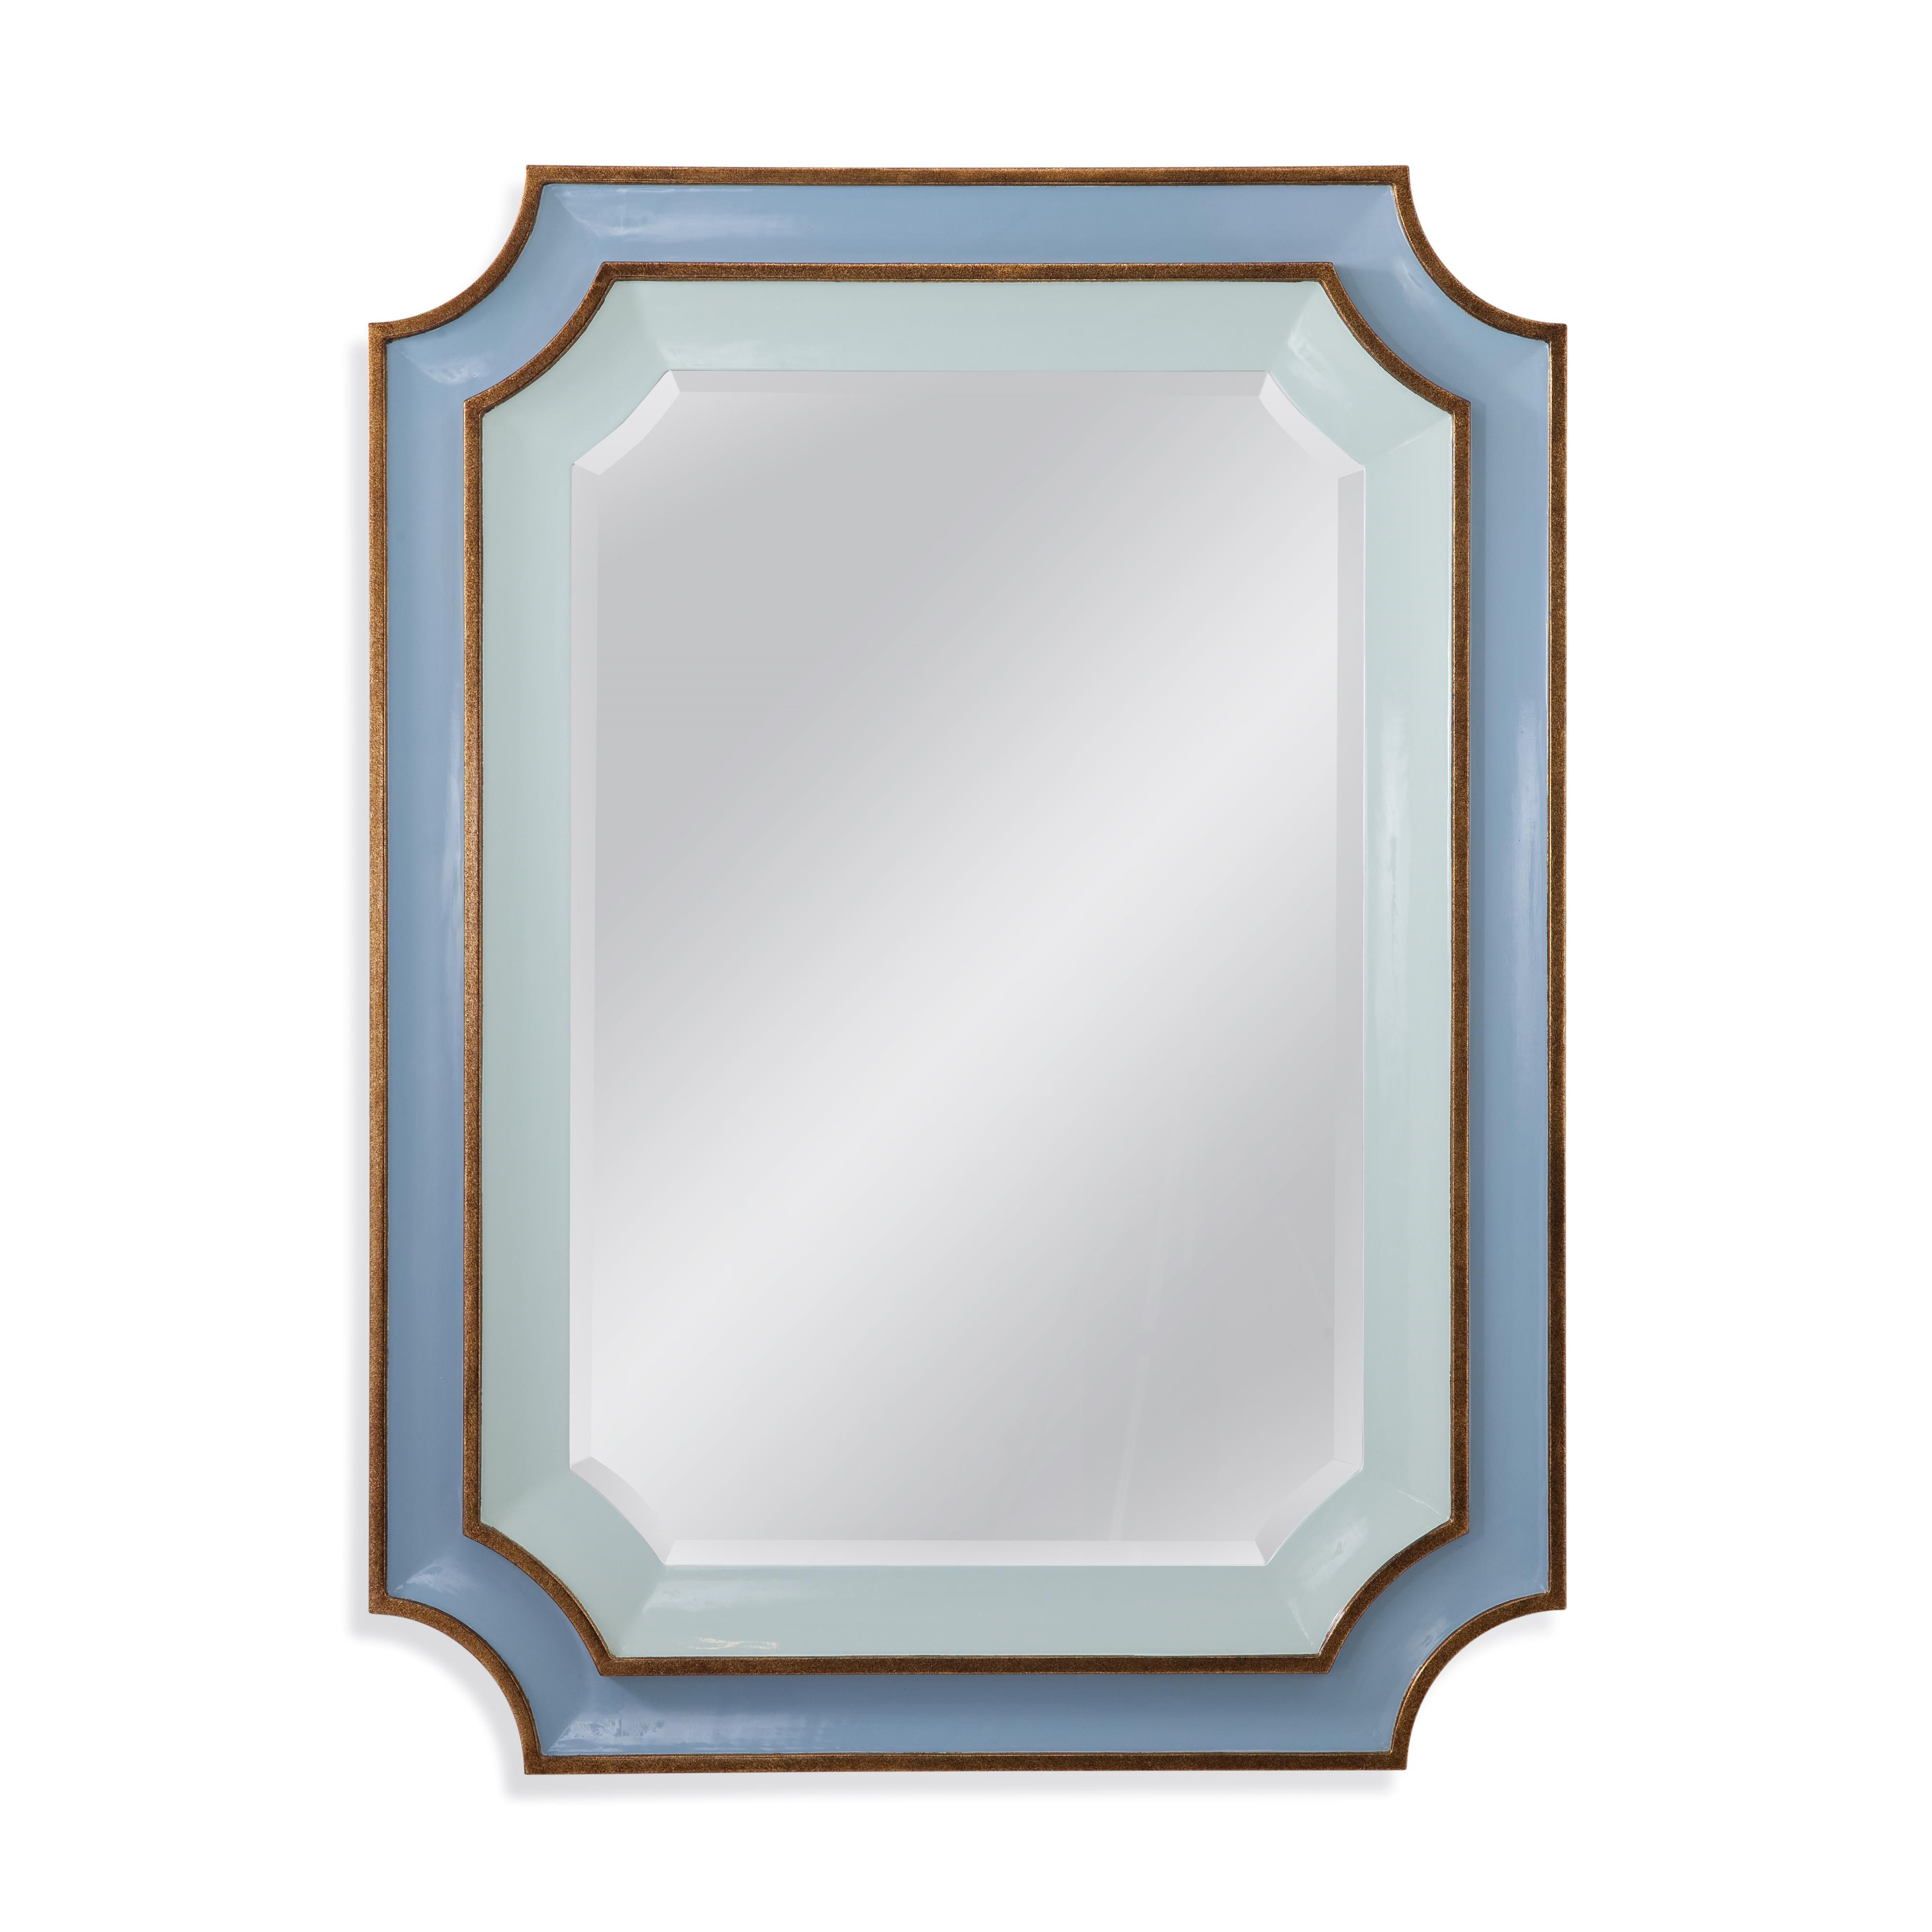 Old World Regency Wall Mirror by Bassett Mirror at Alison Craig Home Furnishings